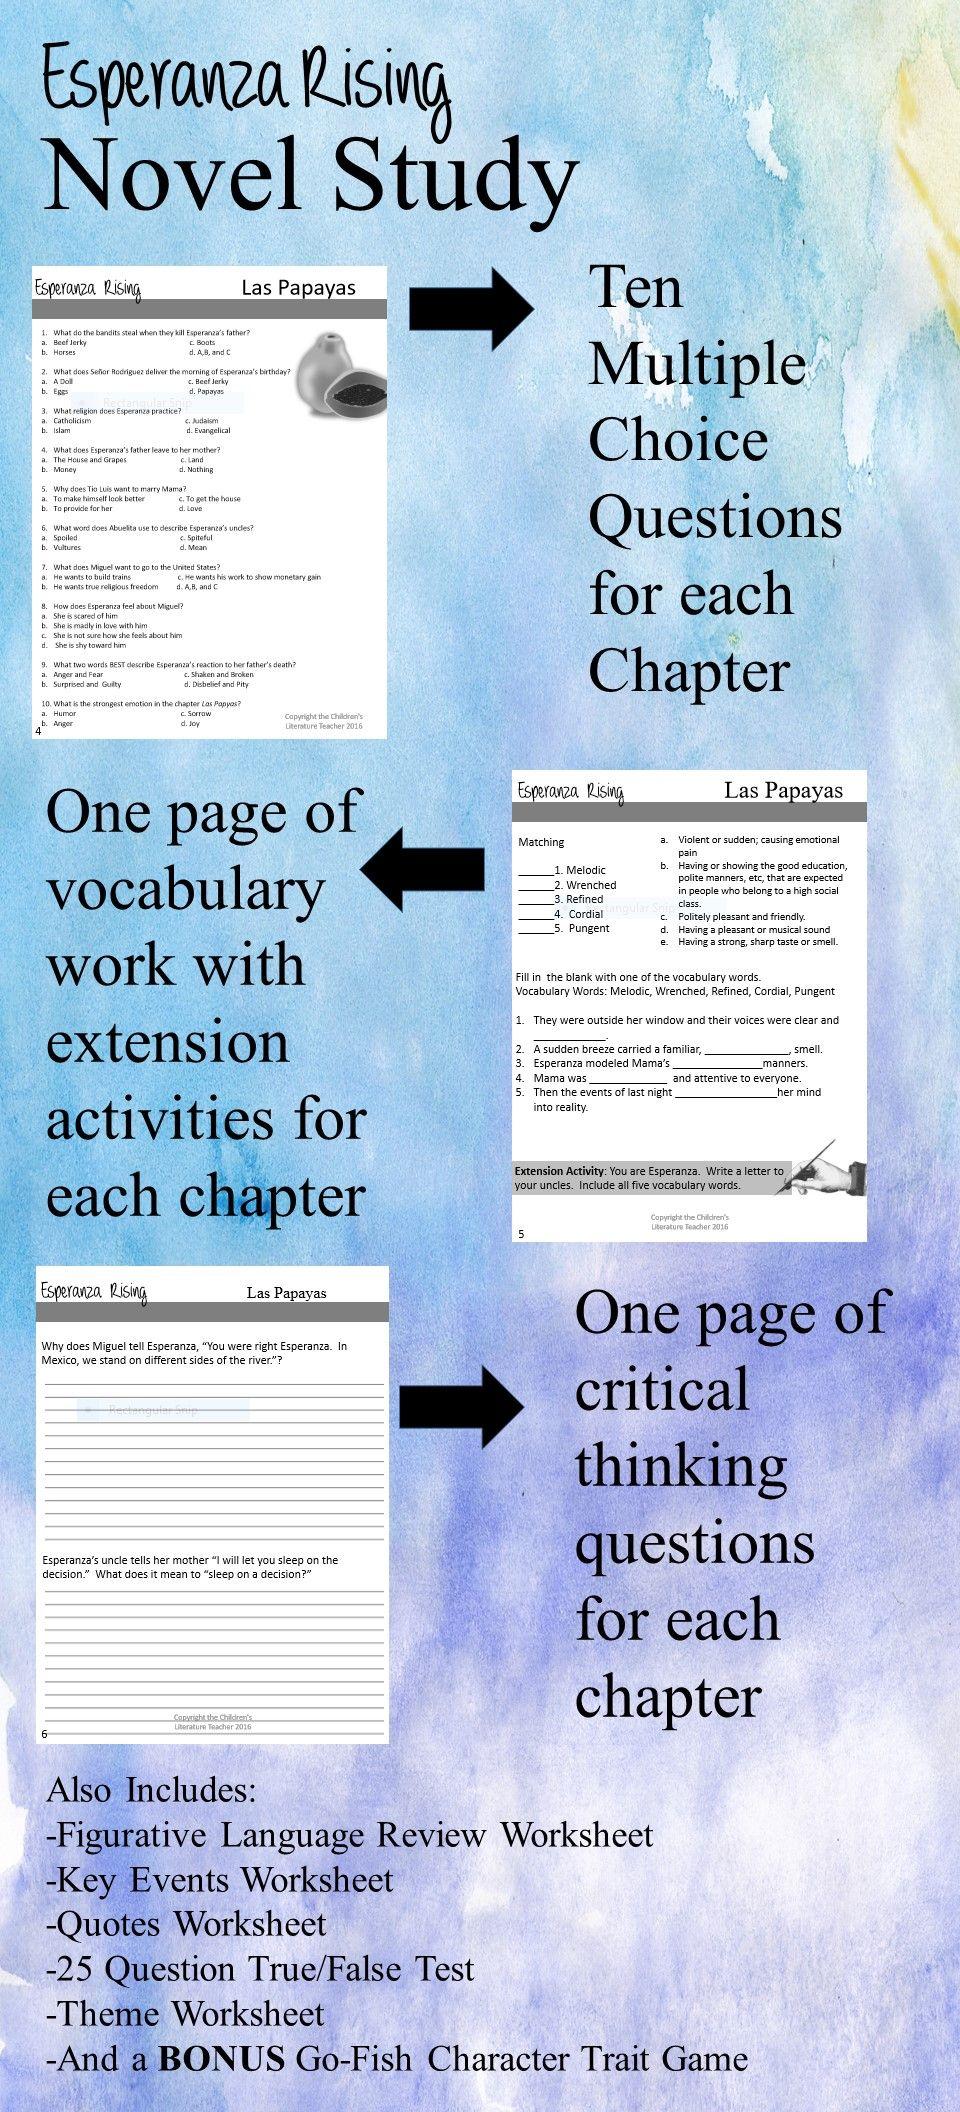 worksheet Esperanza Rising Vocabulary Worksheets esperanza rising complete novel study editable character trait editable